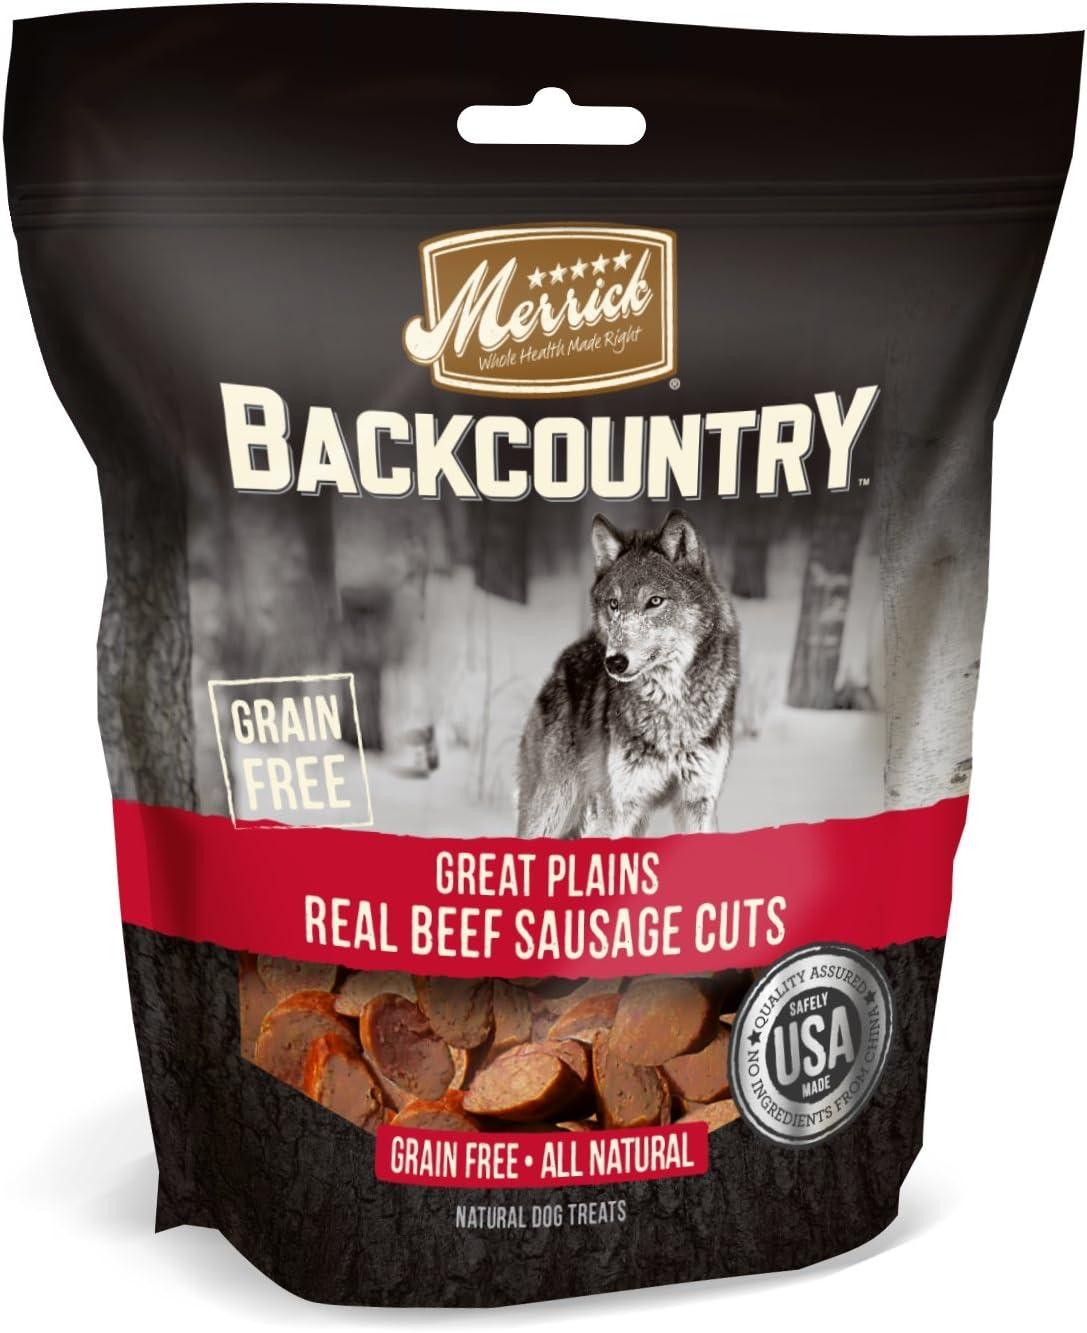 Merrick Backcountry Grain Free All Natural Dog Treats Great Plains Real Beef Sausage Cuts 5oz